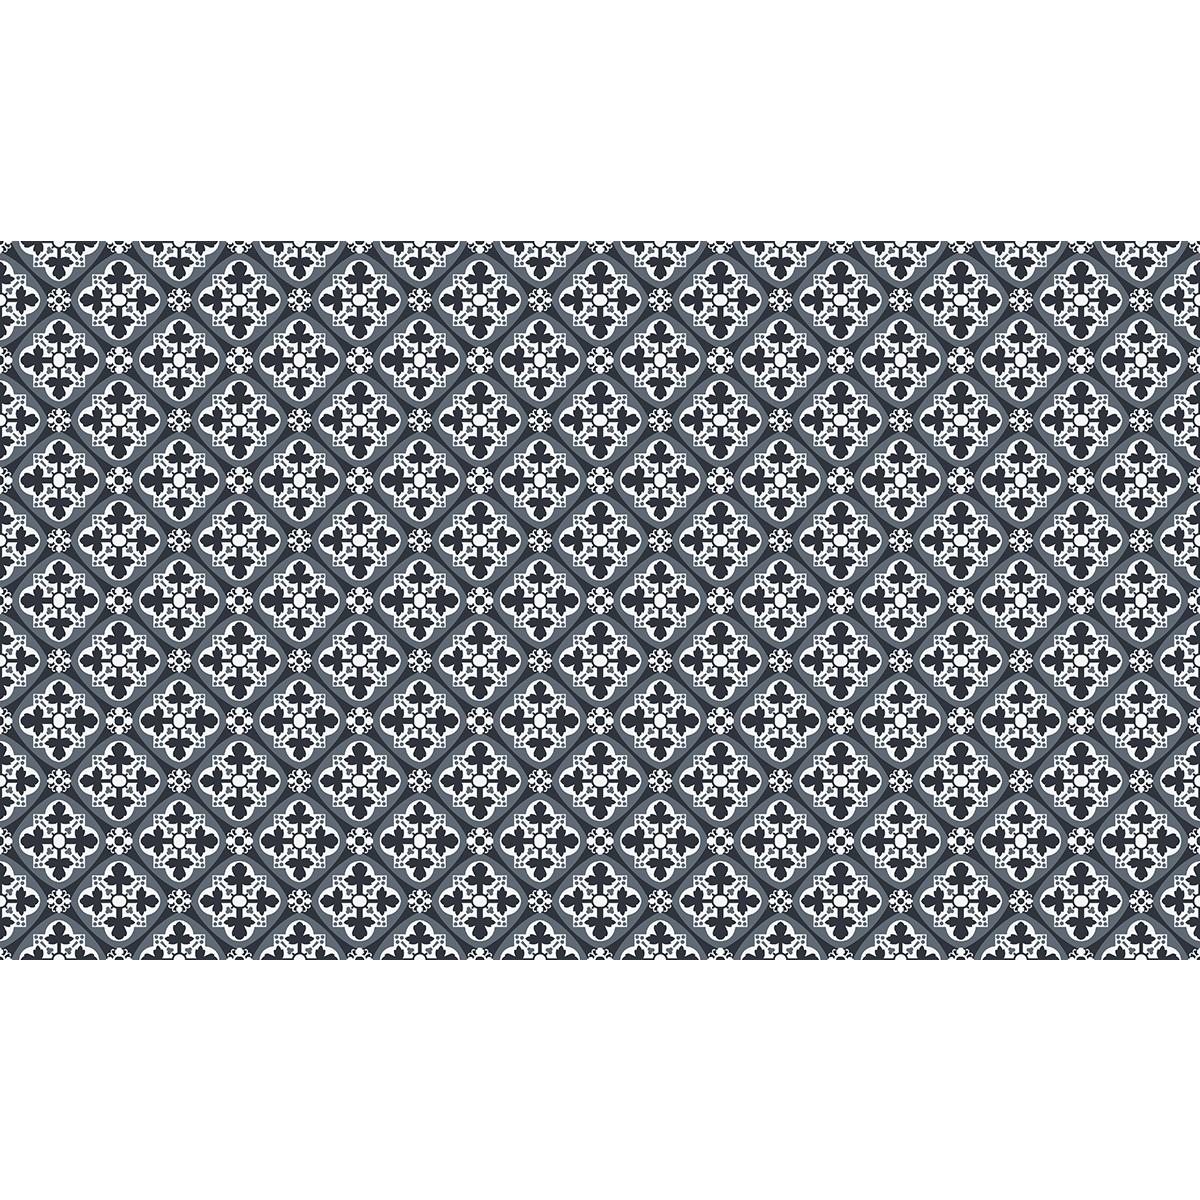 60 stickers carreaux de ciment azulejos ulbaldo cuisine carrelages ambiance sticker. Black Bedroom Furniture Sets. Home Design Ideas